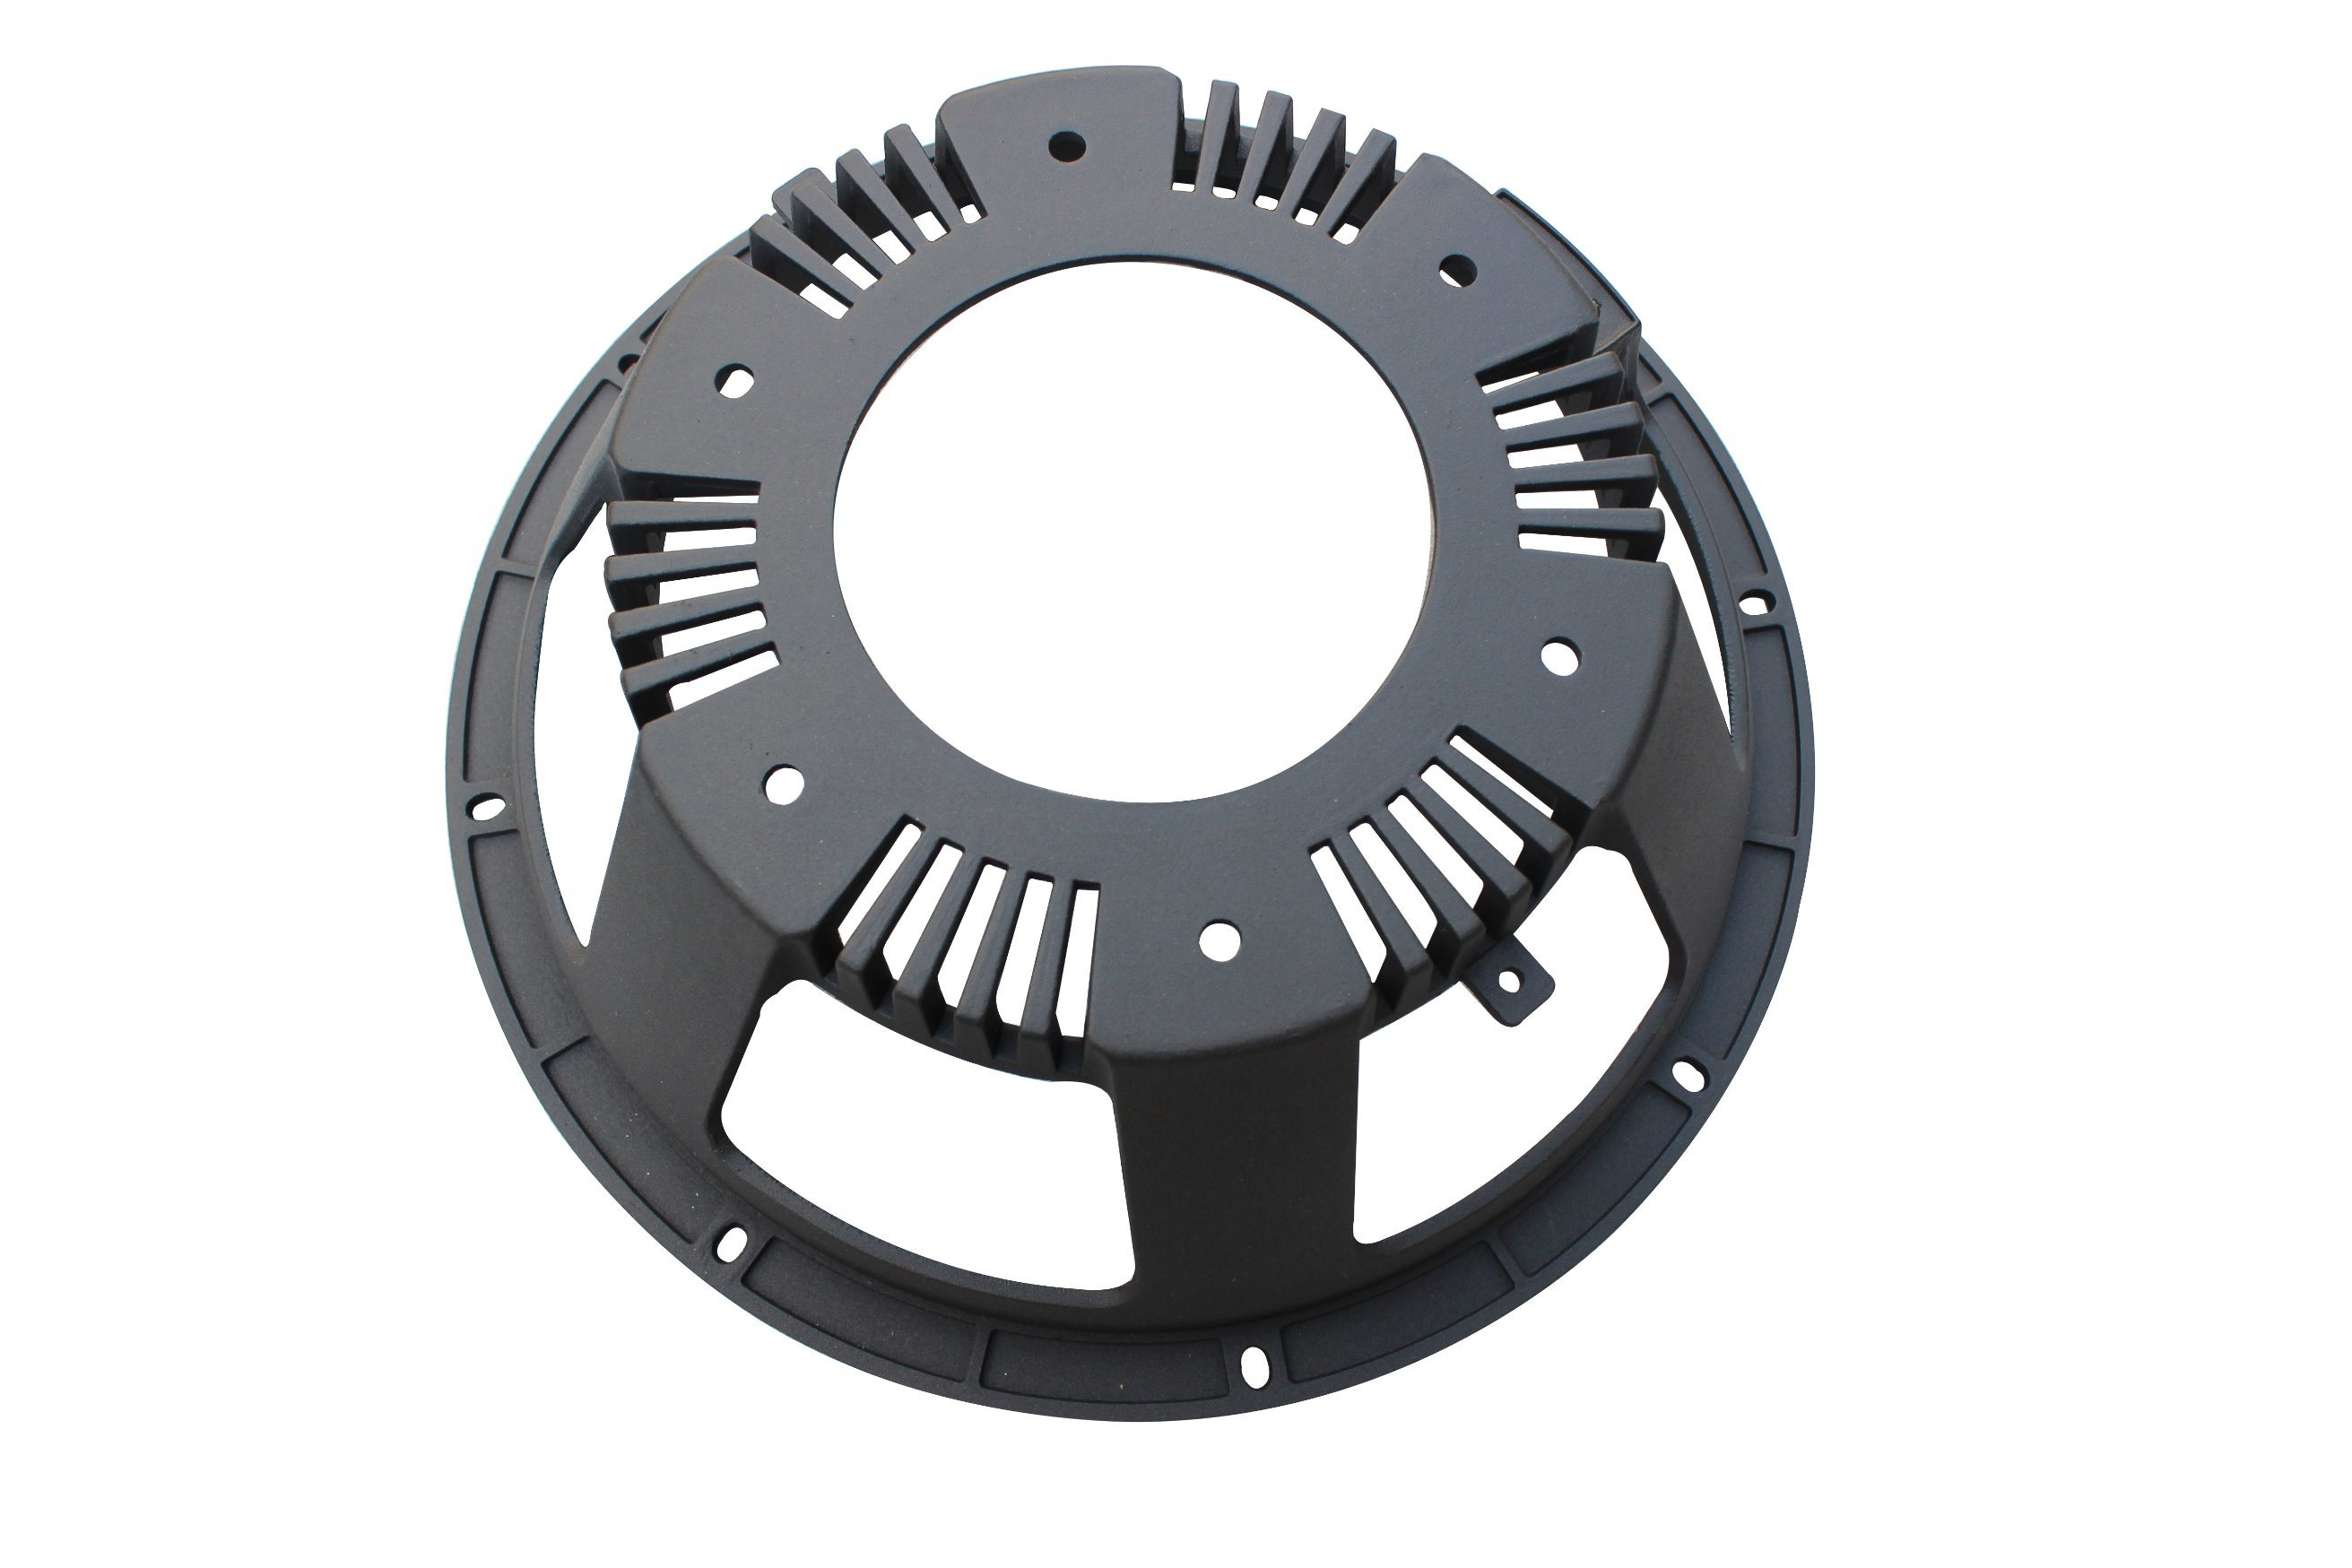 15inch Factory Low Price Aluminium Frame-Speaker Frame